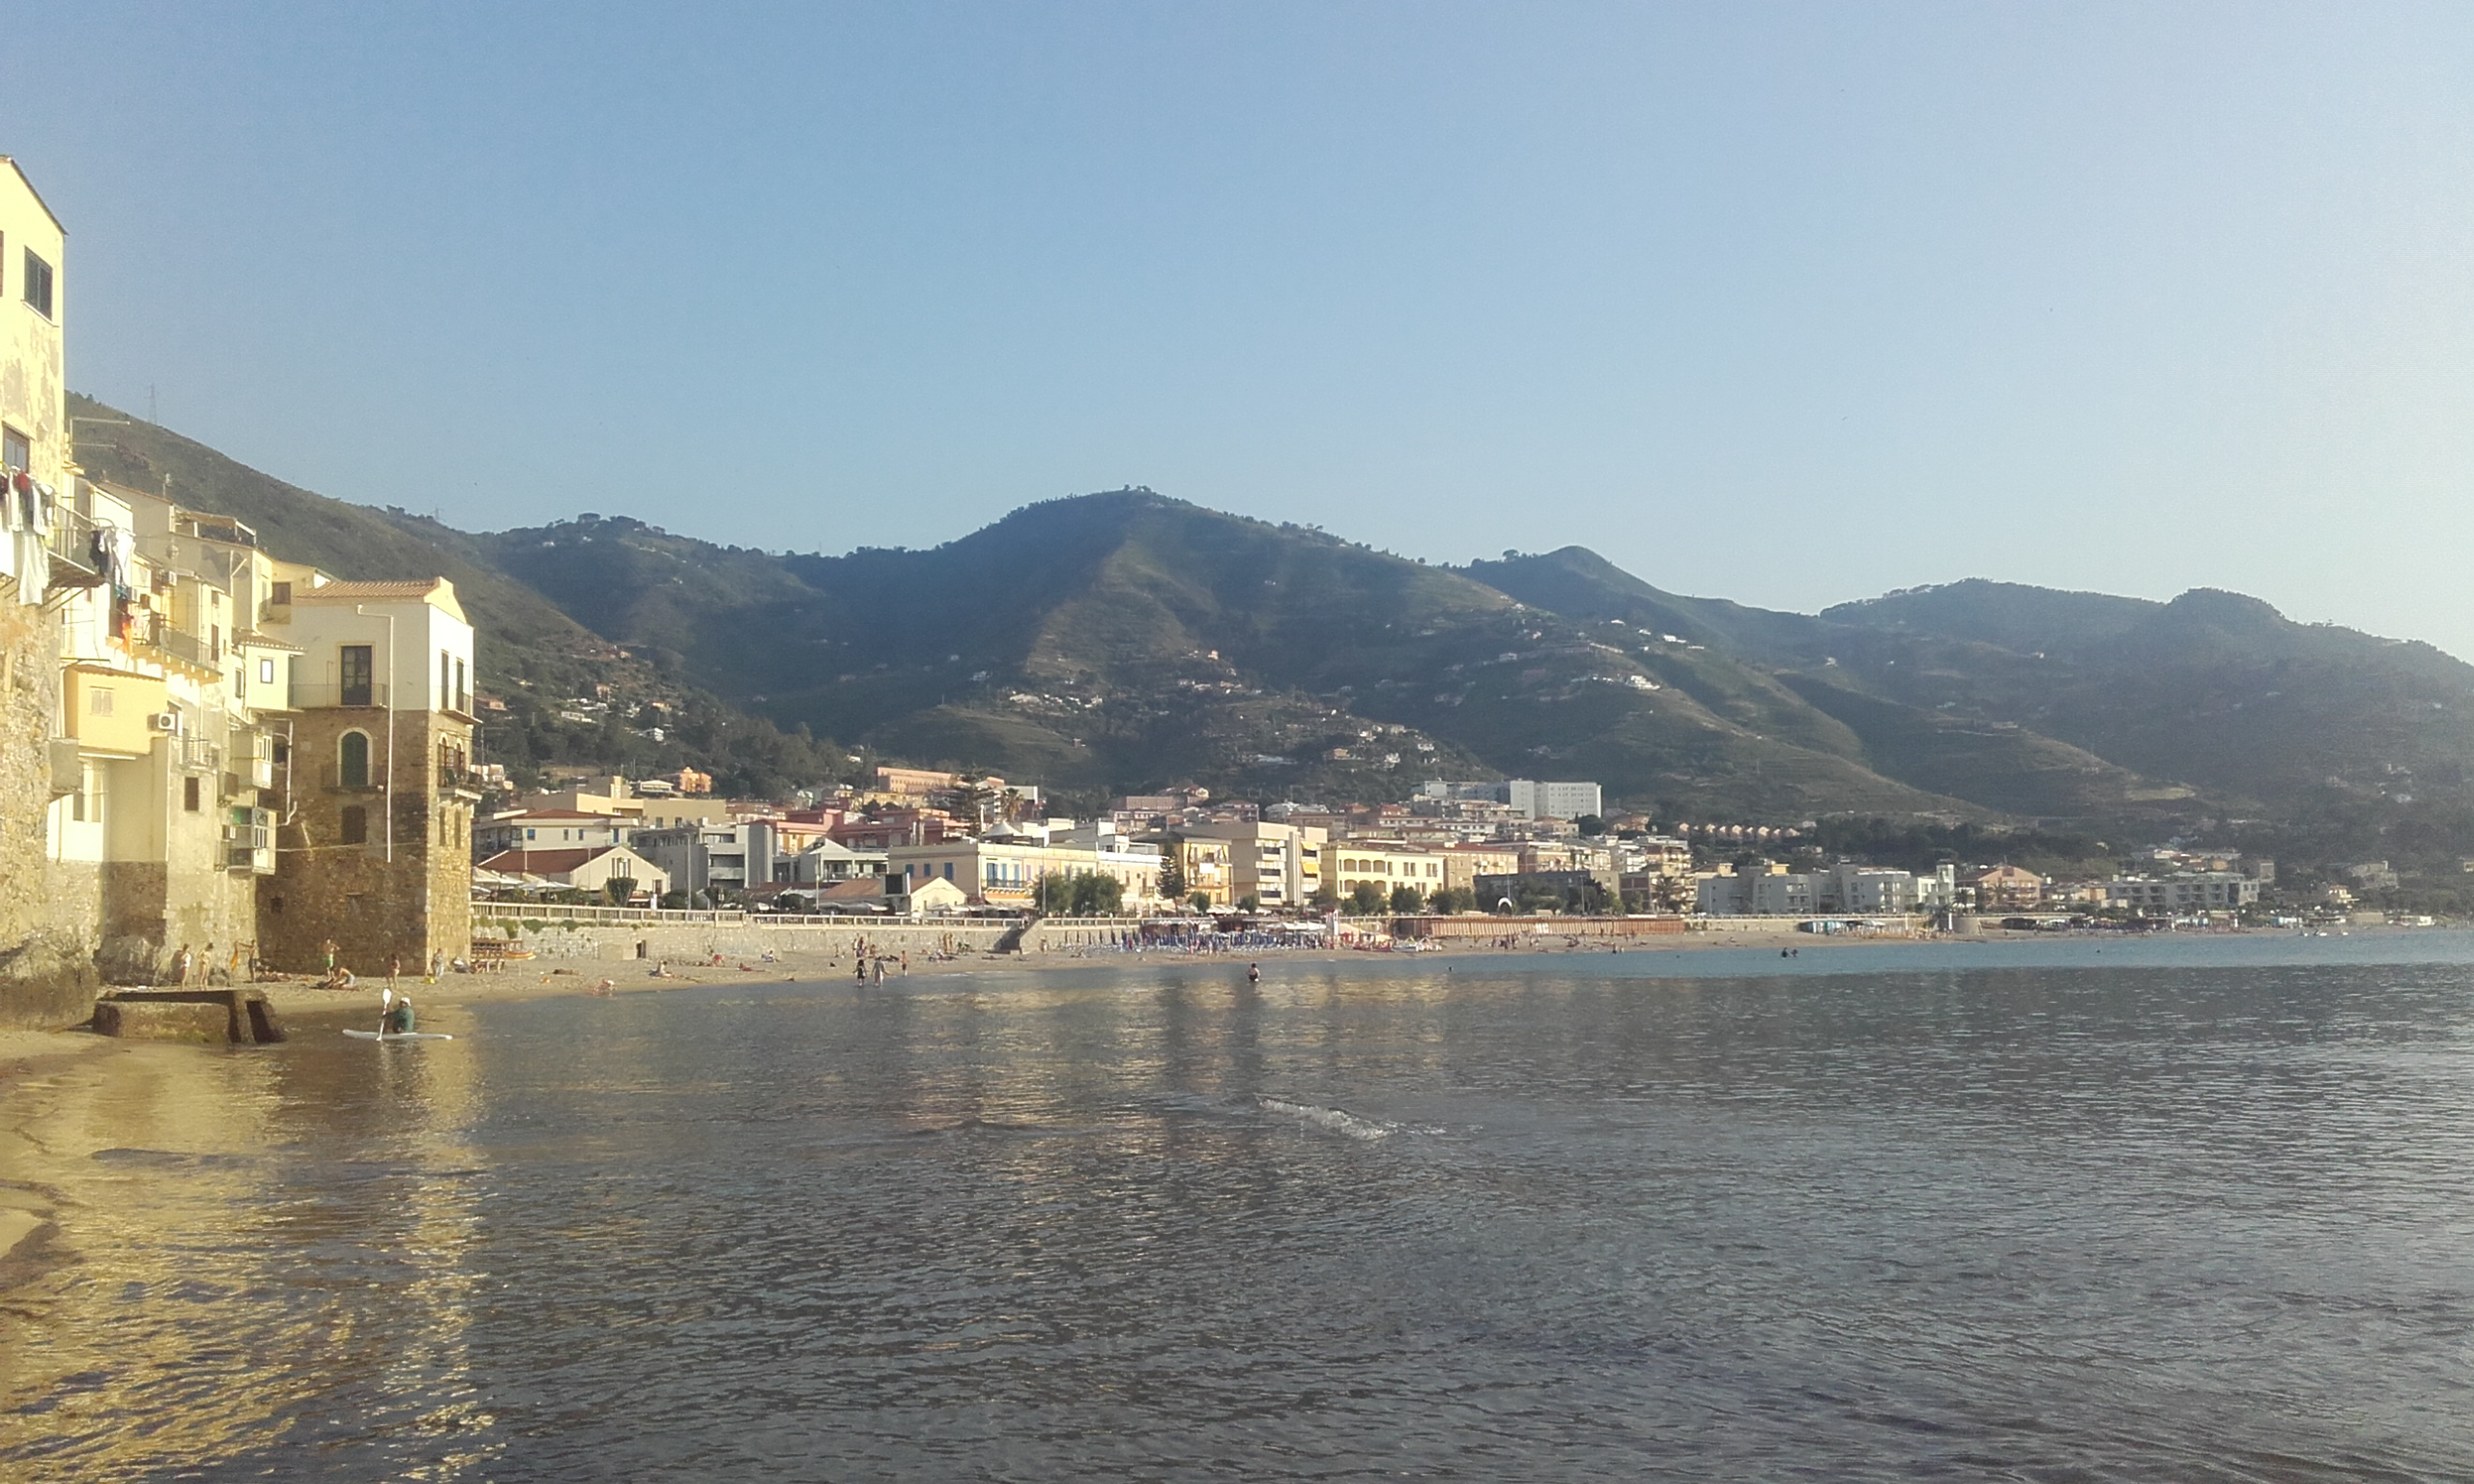 Paseando por la orilla de la playa